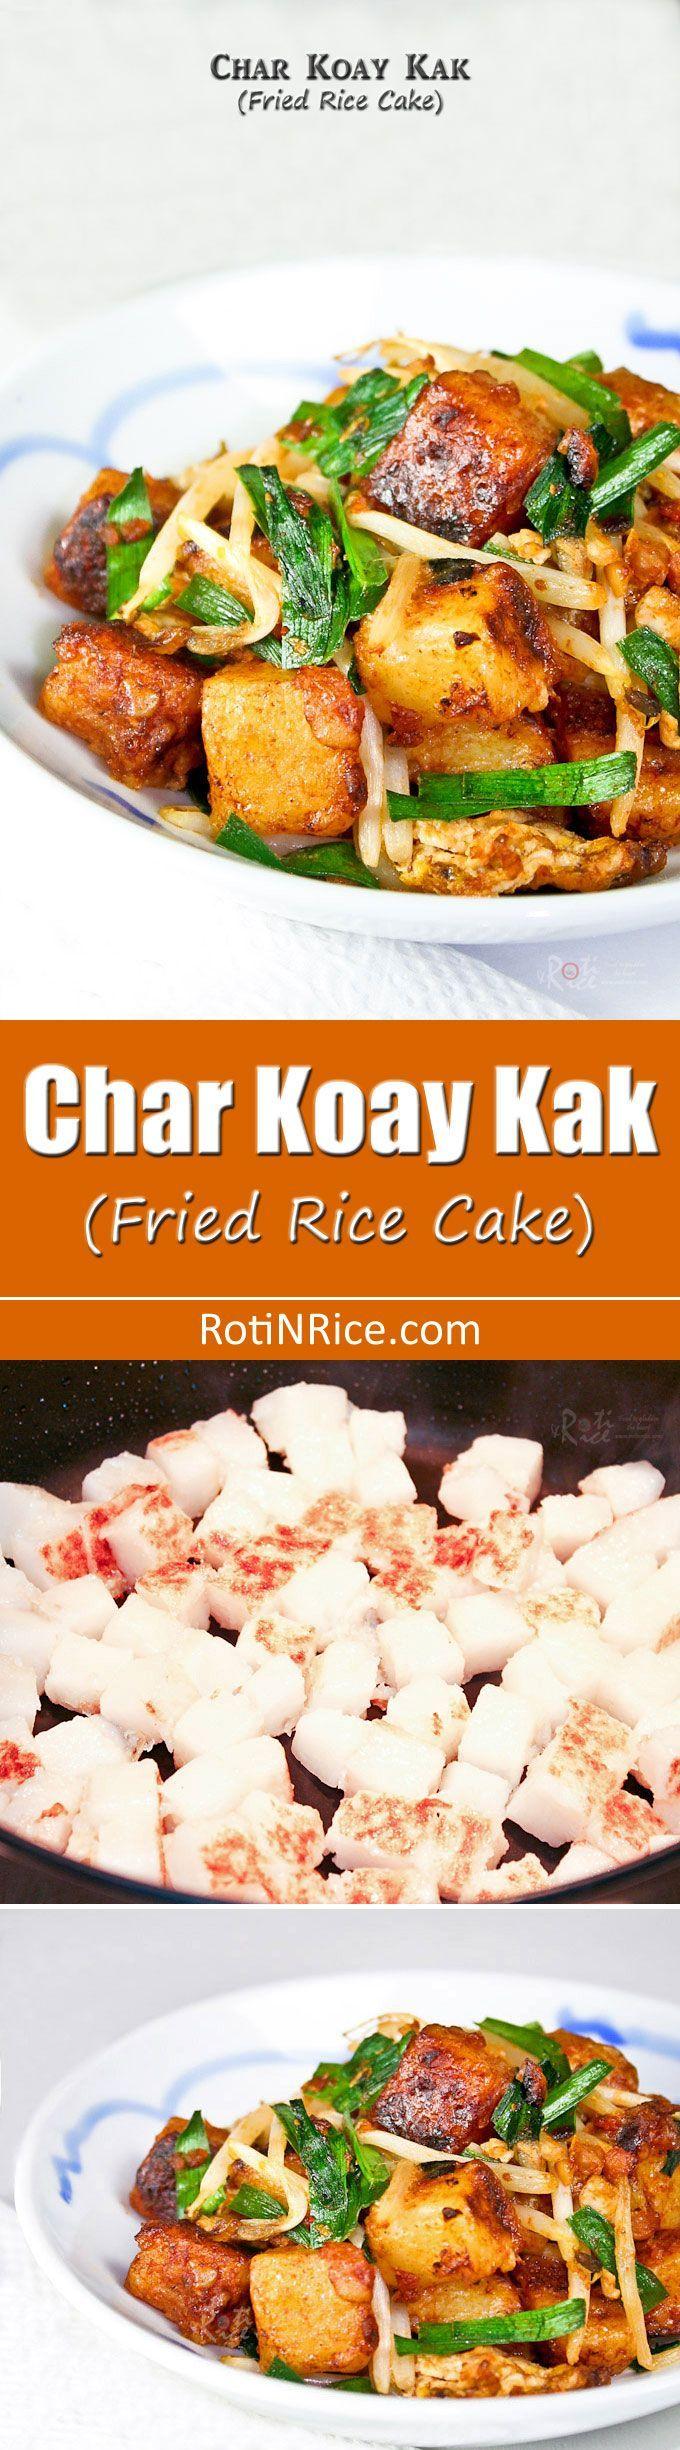 Prepare your own amazingly tasty Char Koay Kak (Fried Rice Cake), a popular…